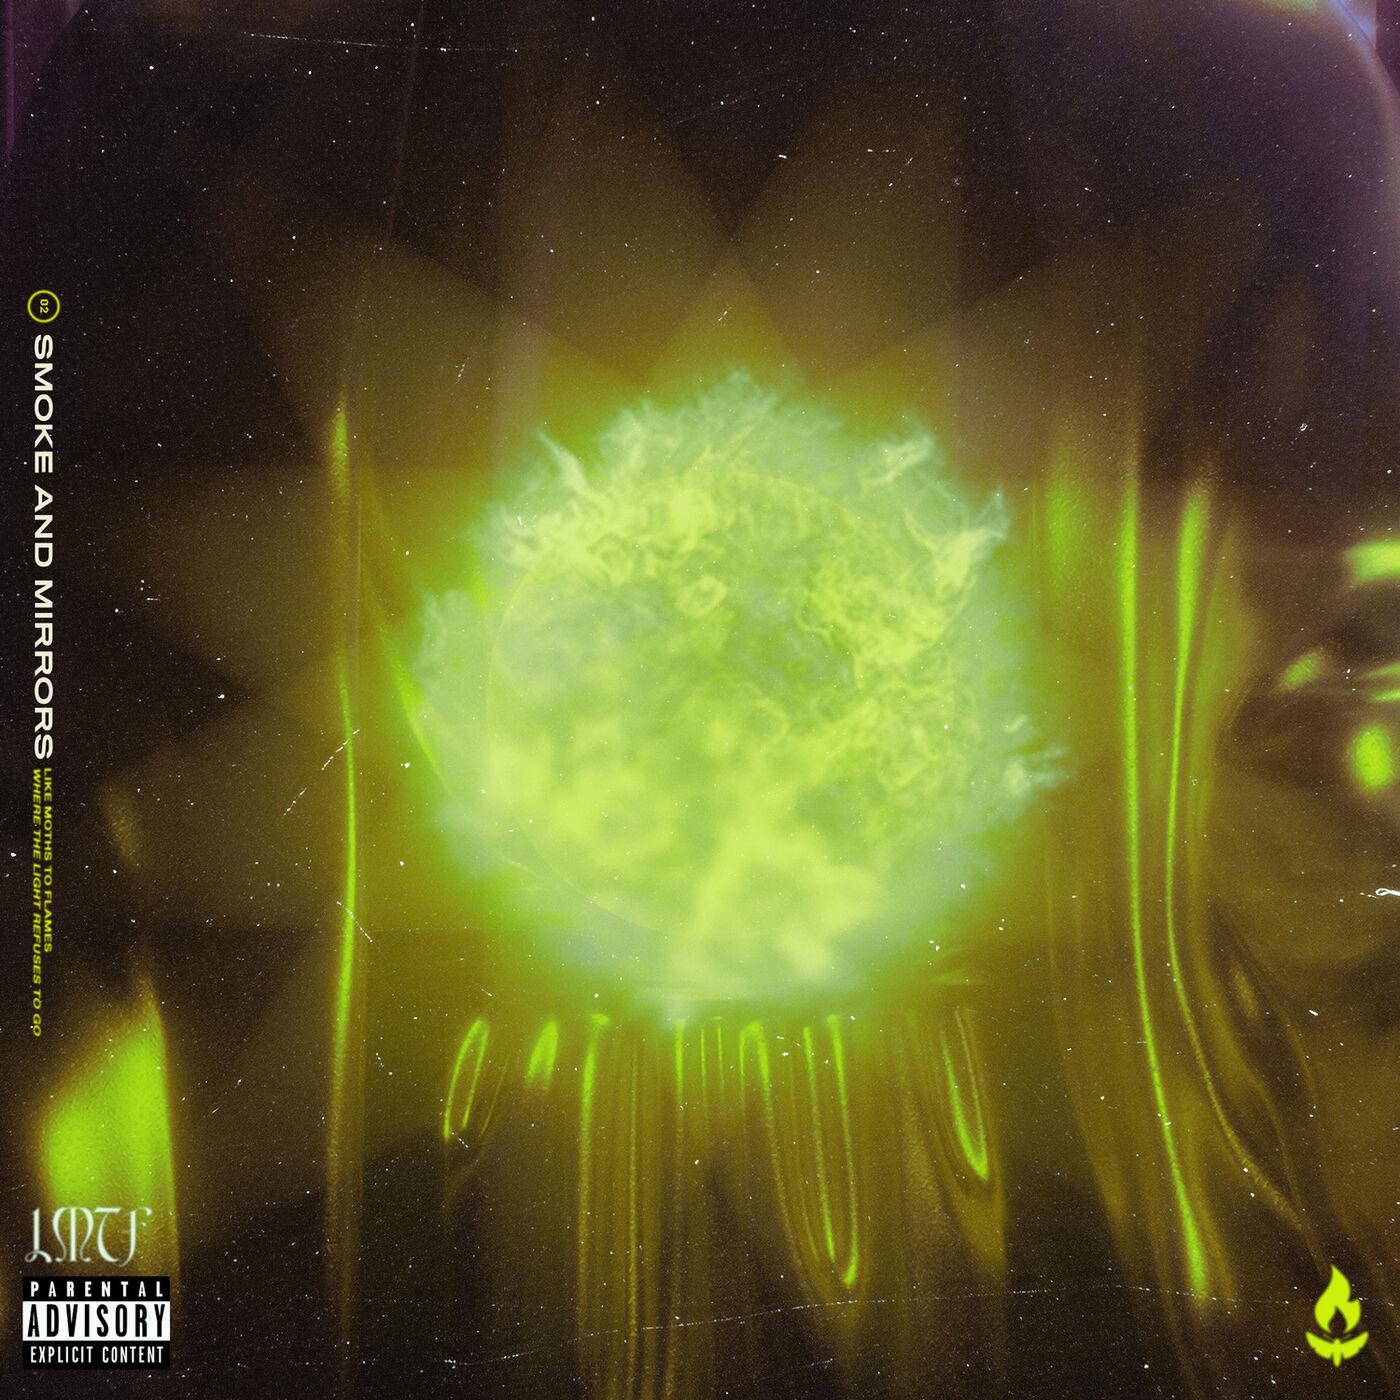 Like Moths to Flames - Smoke and Mirrors [single] (2019)